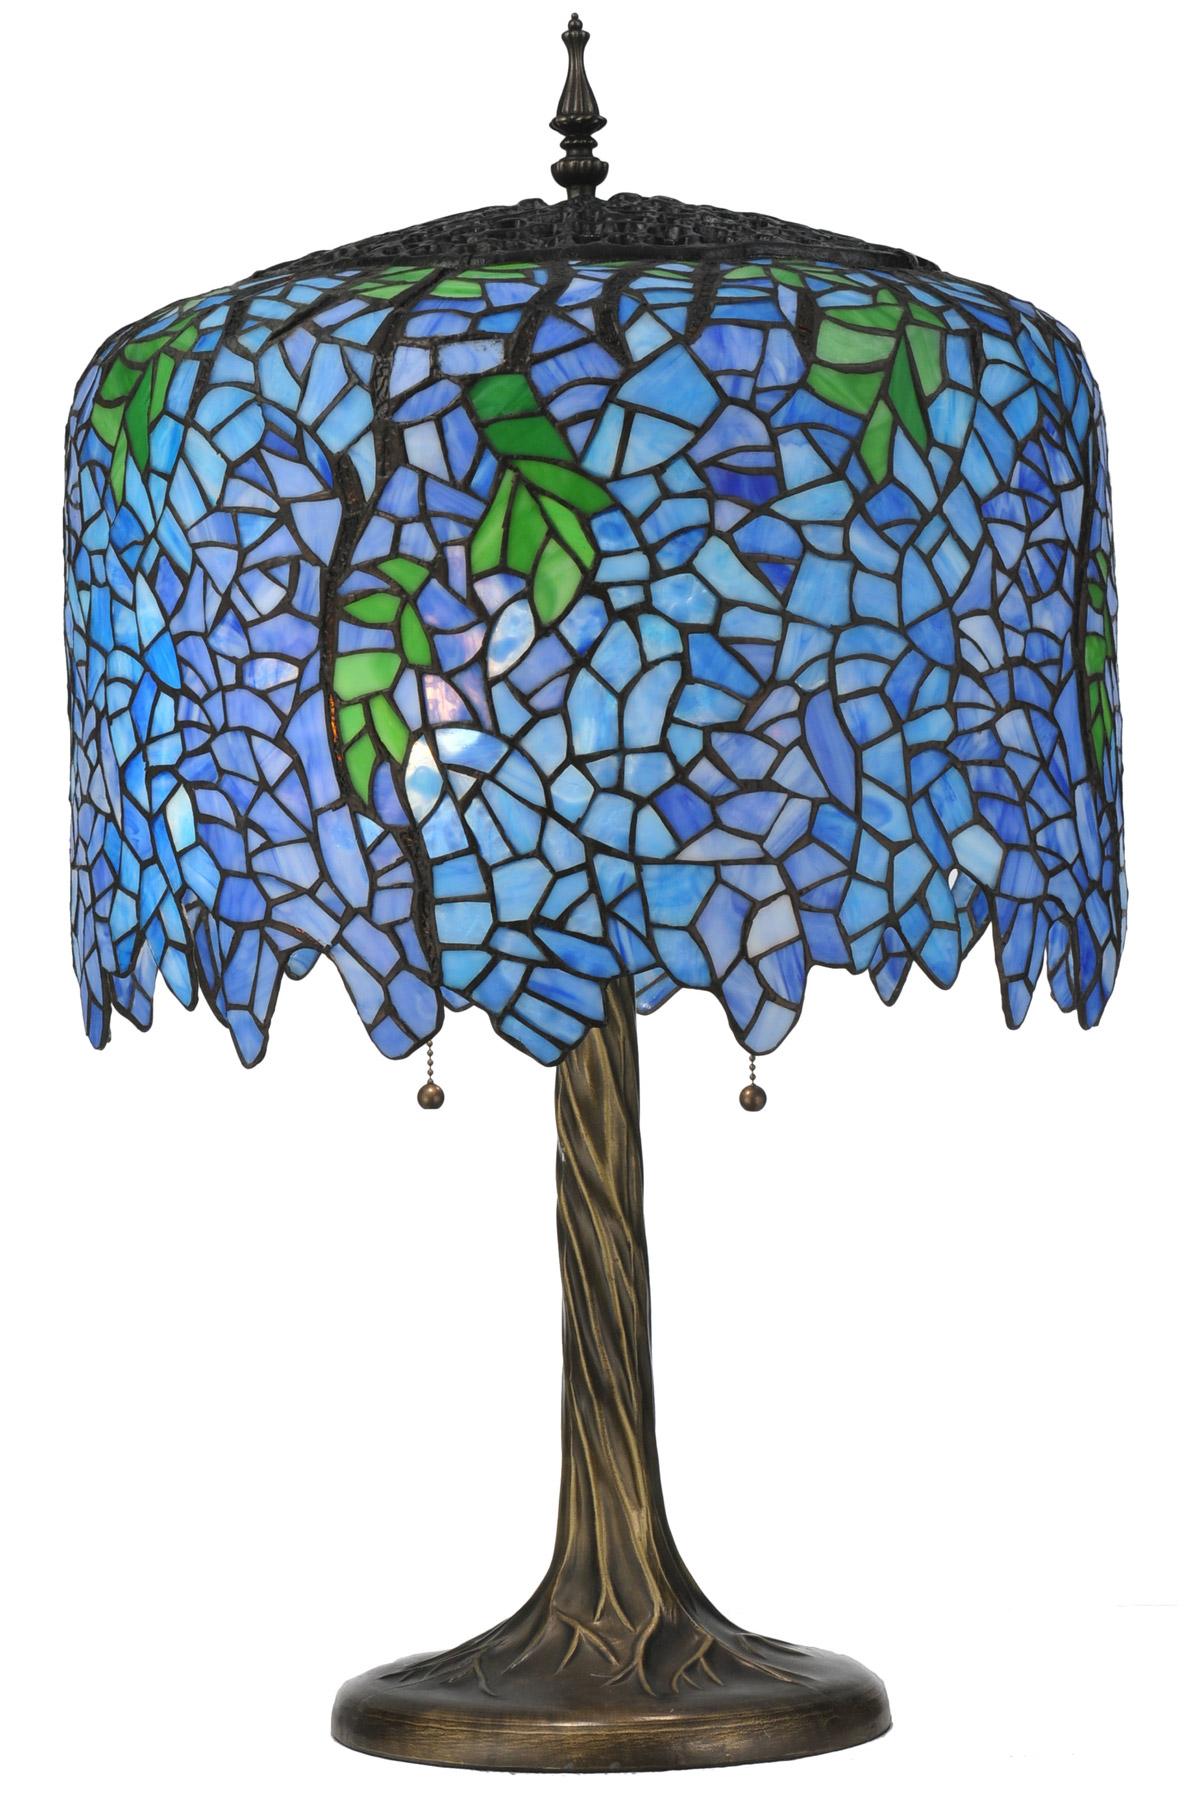 Meyda 118689 Wisteria Table Lamp